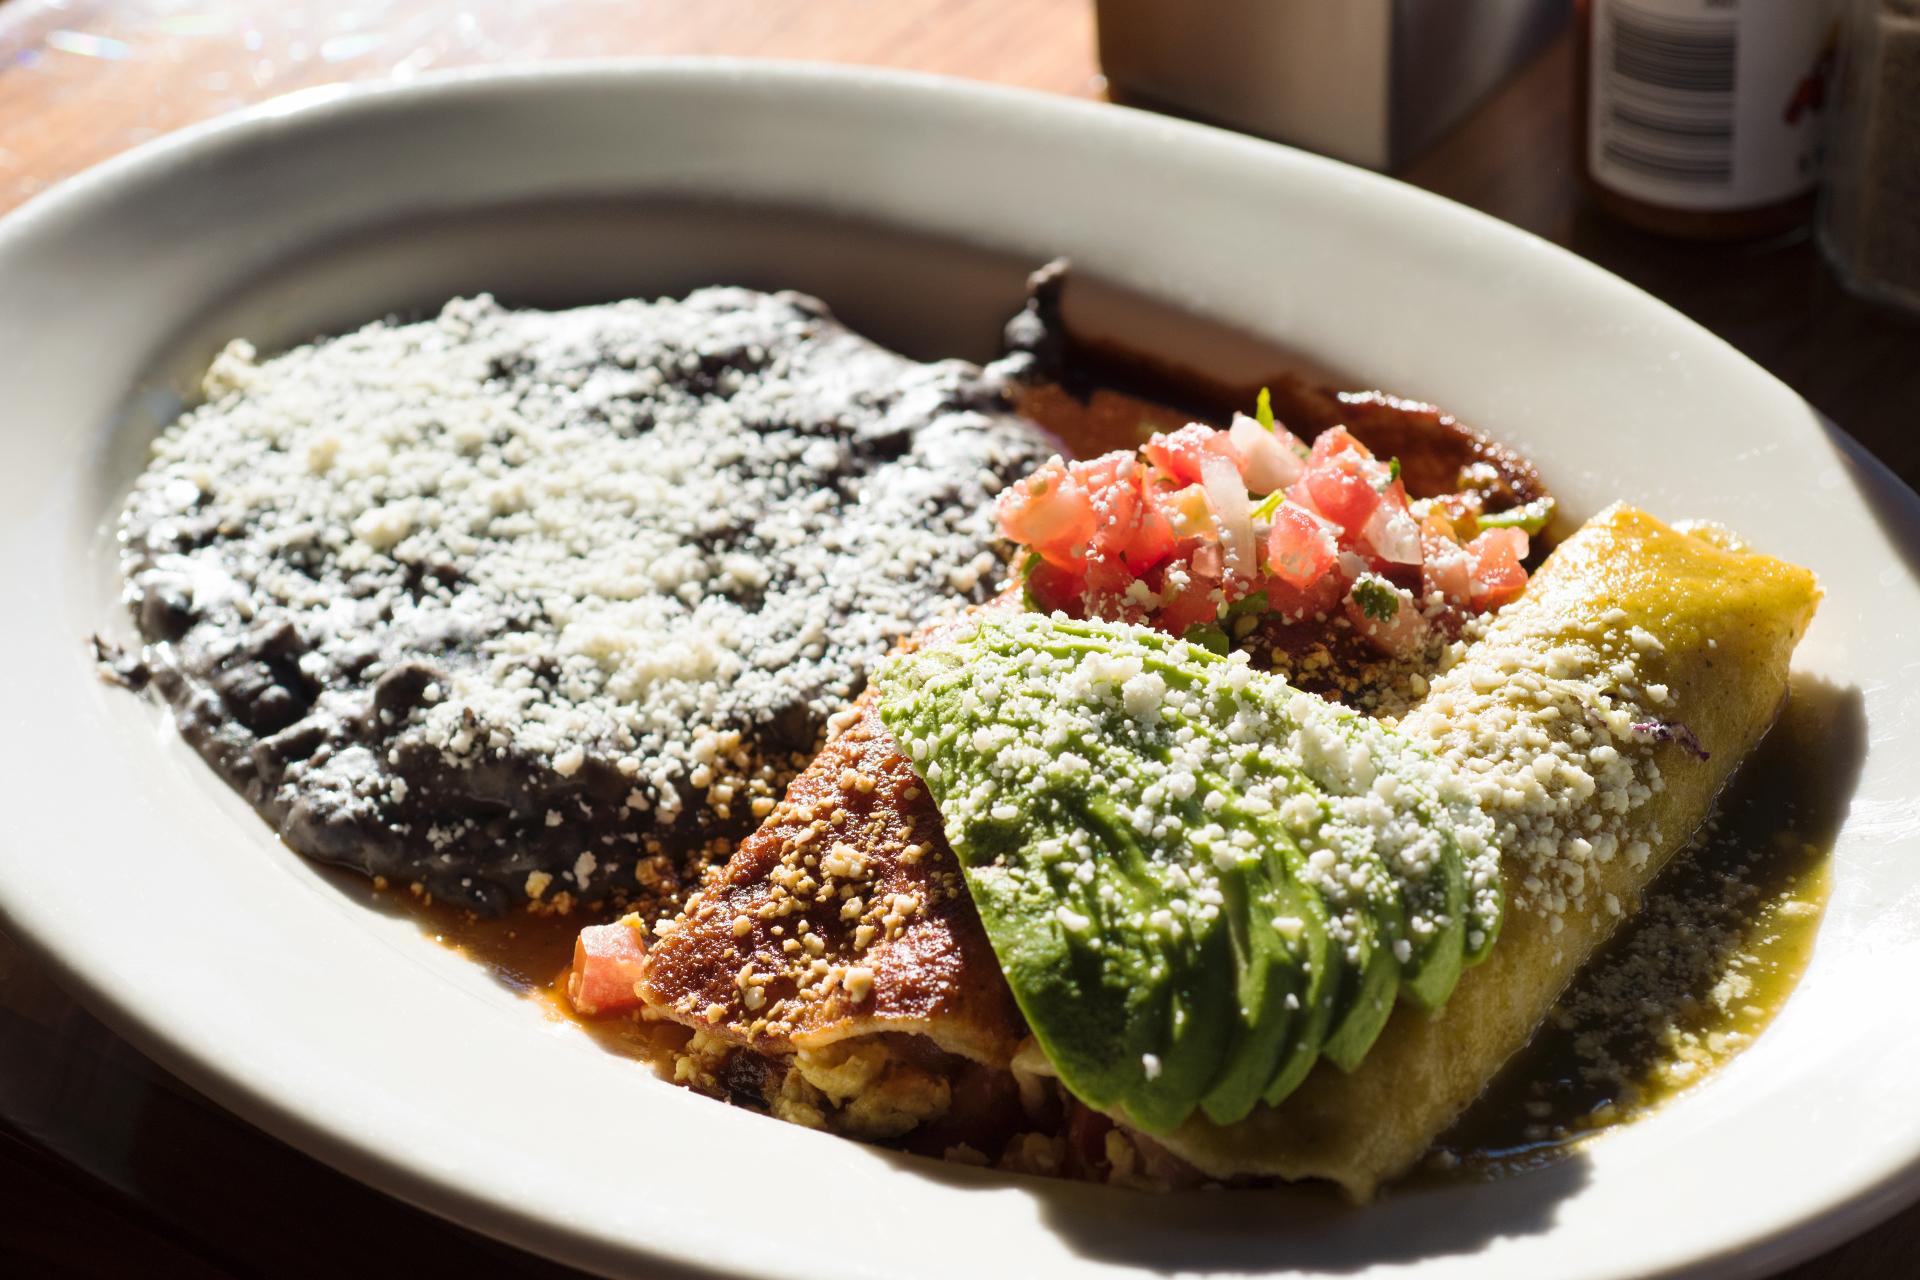 Eric's Breakfast Enchiladas